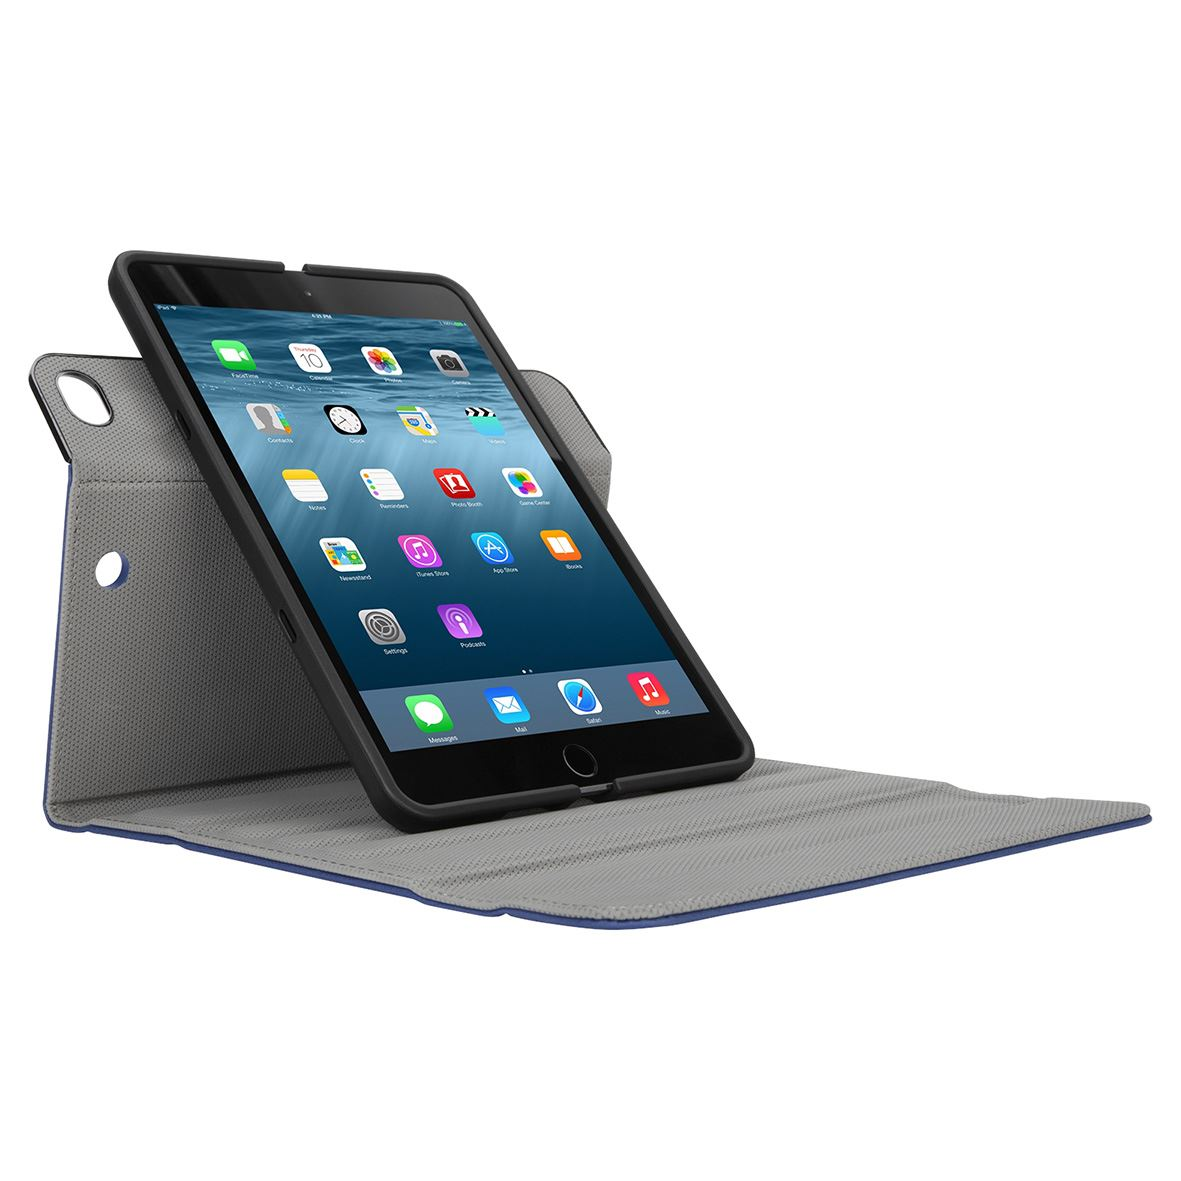 jetech ipad 2 3 4 h lle case tasche schutzh lle f r apple ipad 4 ipad 3 ipad 2 mit auto. Black Bedroom Furniture Sets. Home Design Ideas